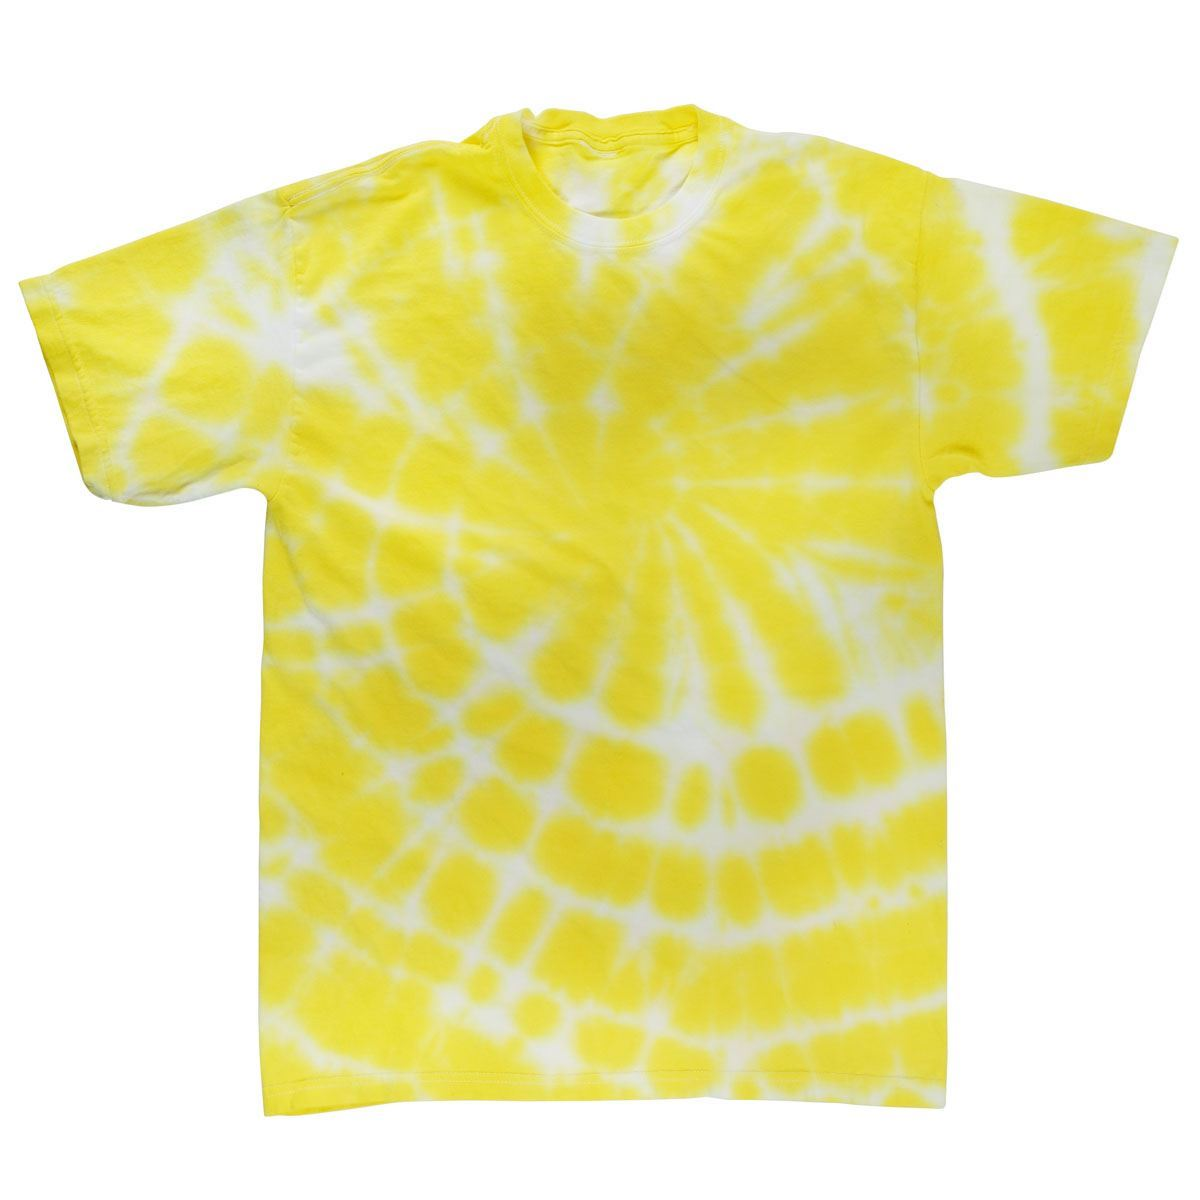 Yellow Tie Dye T-shirt